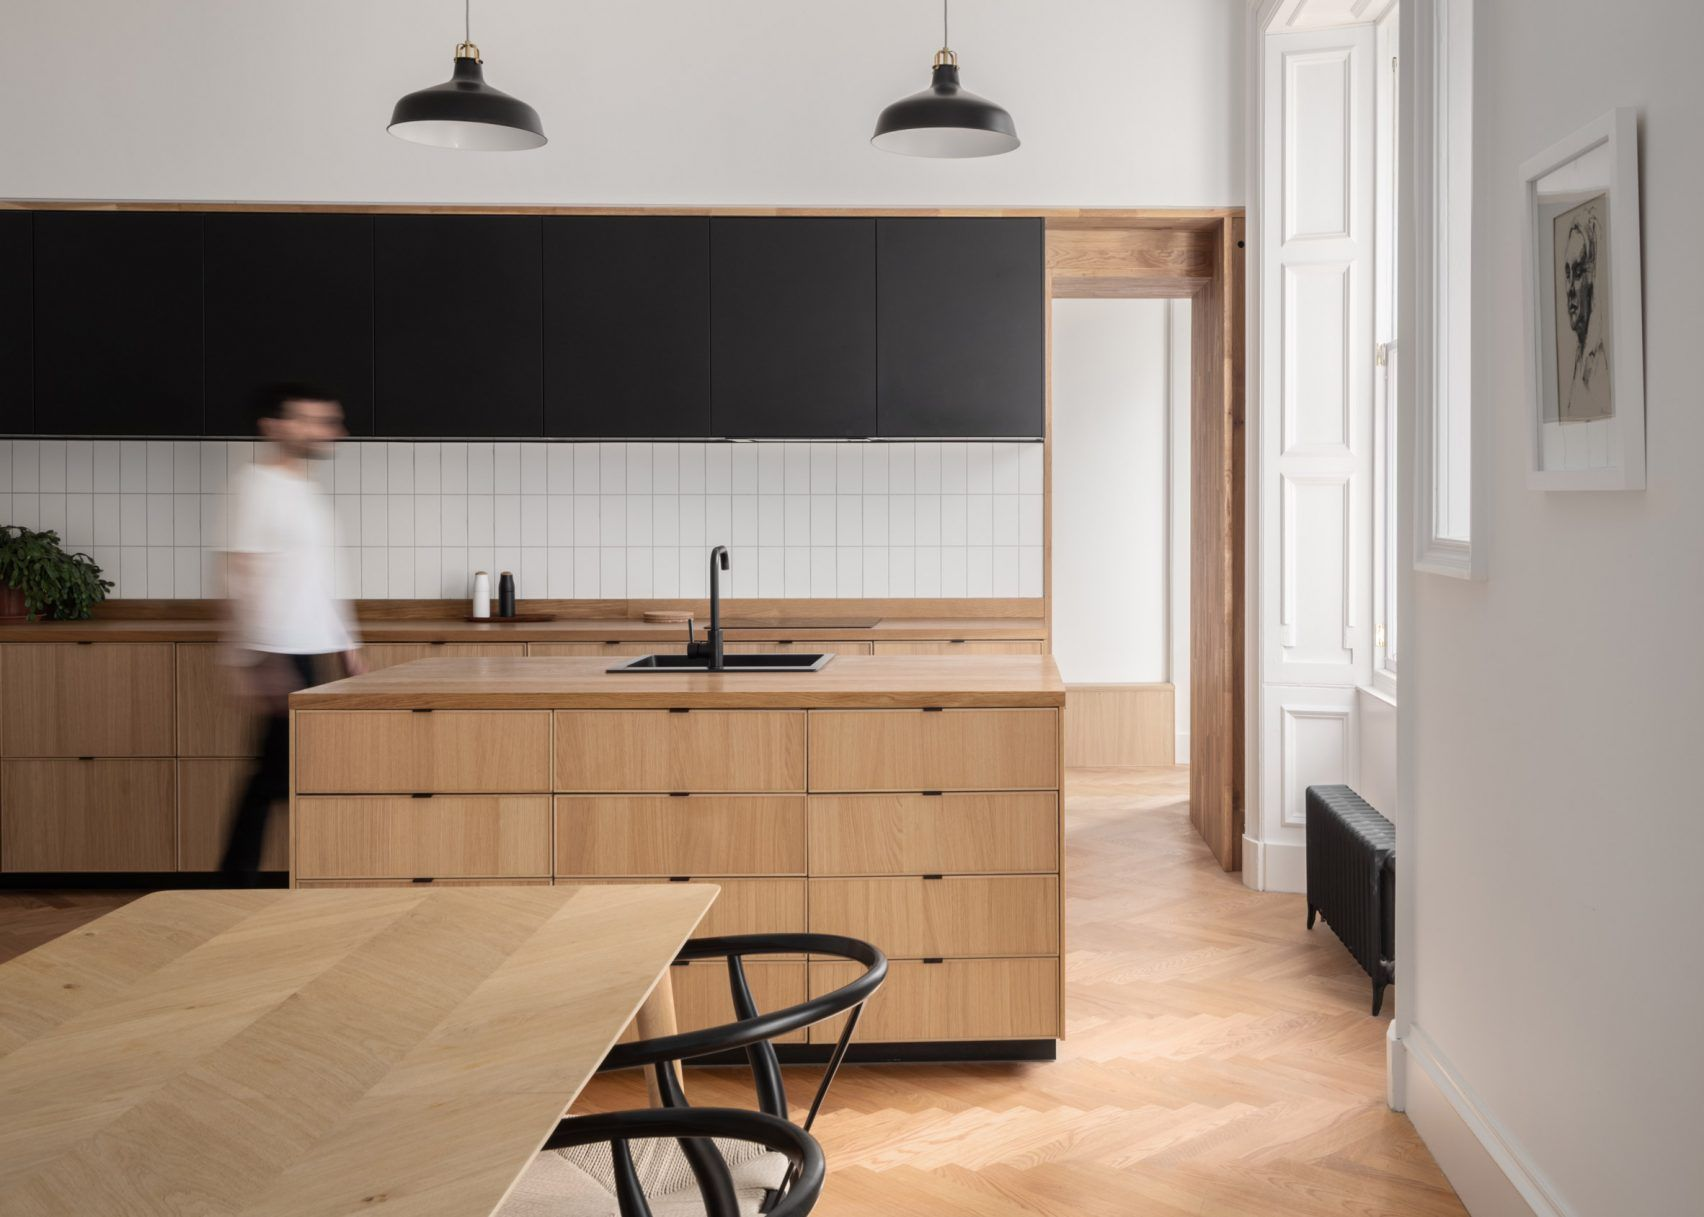 edinburgh-apartment-interiors-luke-mcclelland-joanne dezeen 2364 col 12-1704x1217